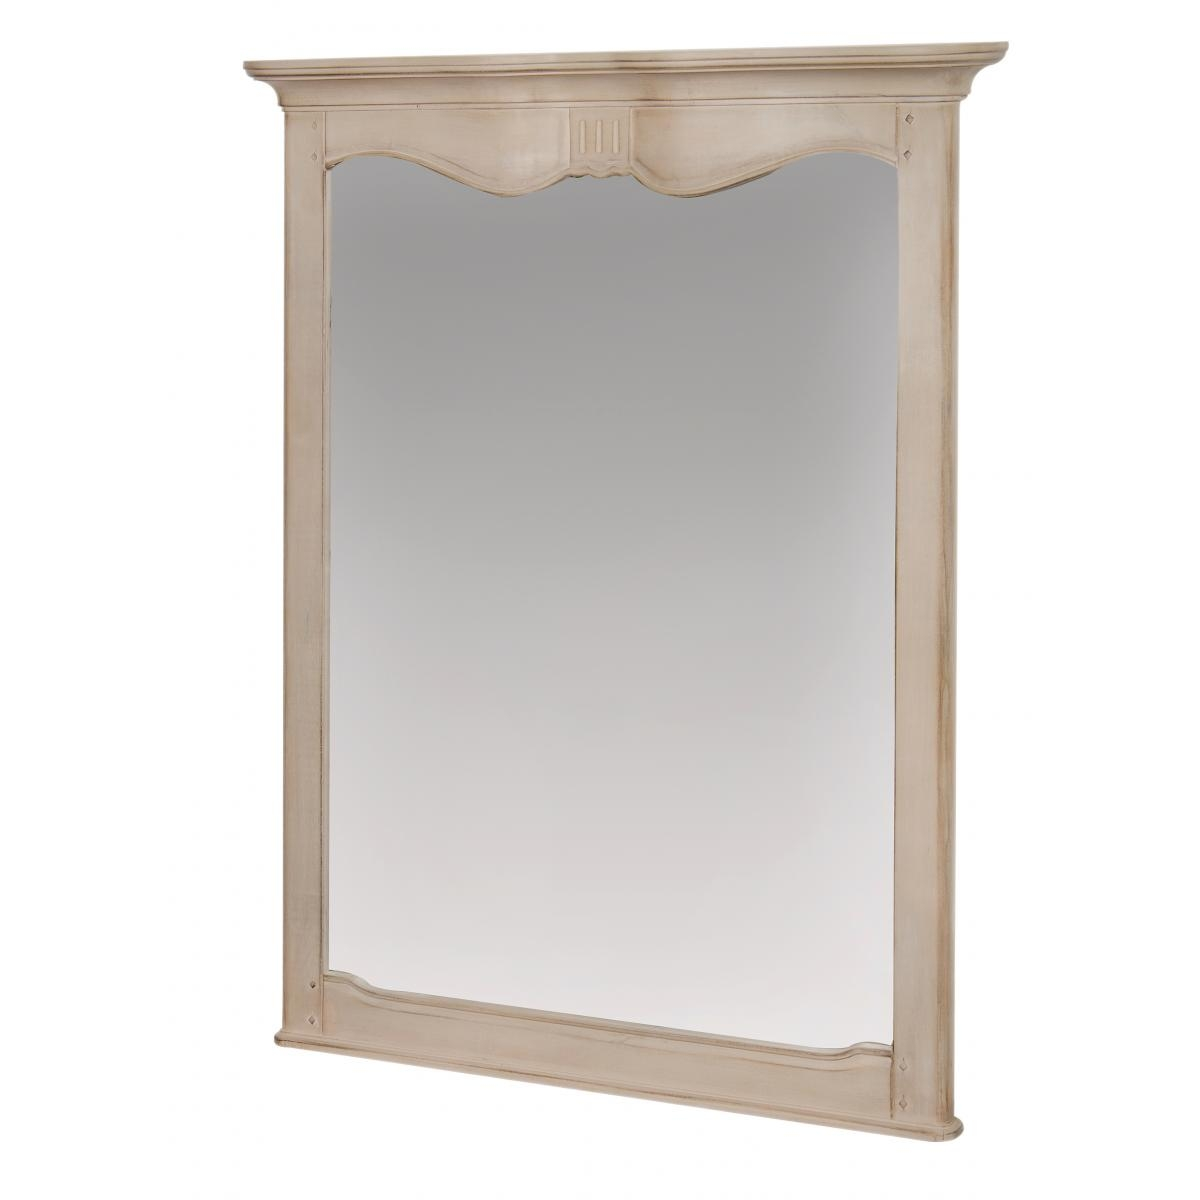 Oglinda decorativa din lemn de mesteacan Venezia VE816K